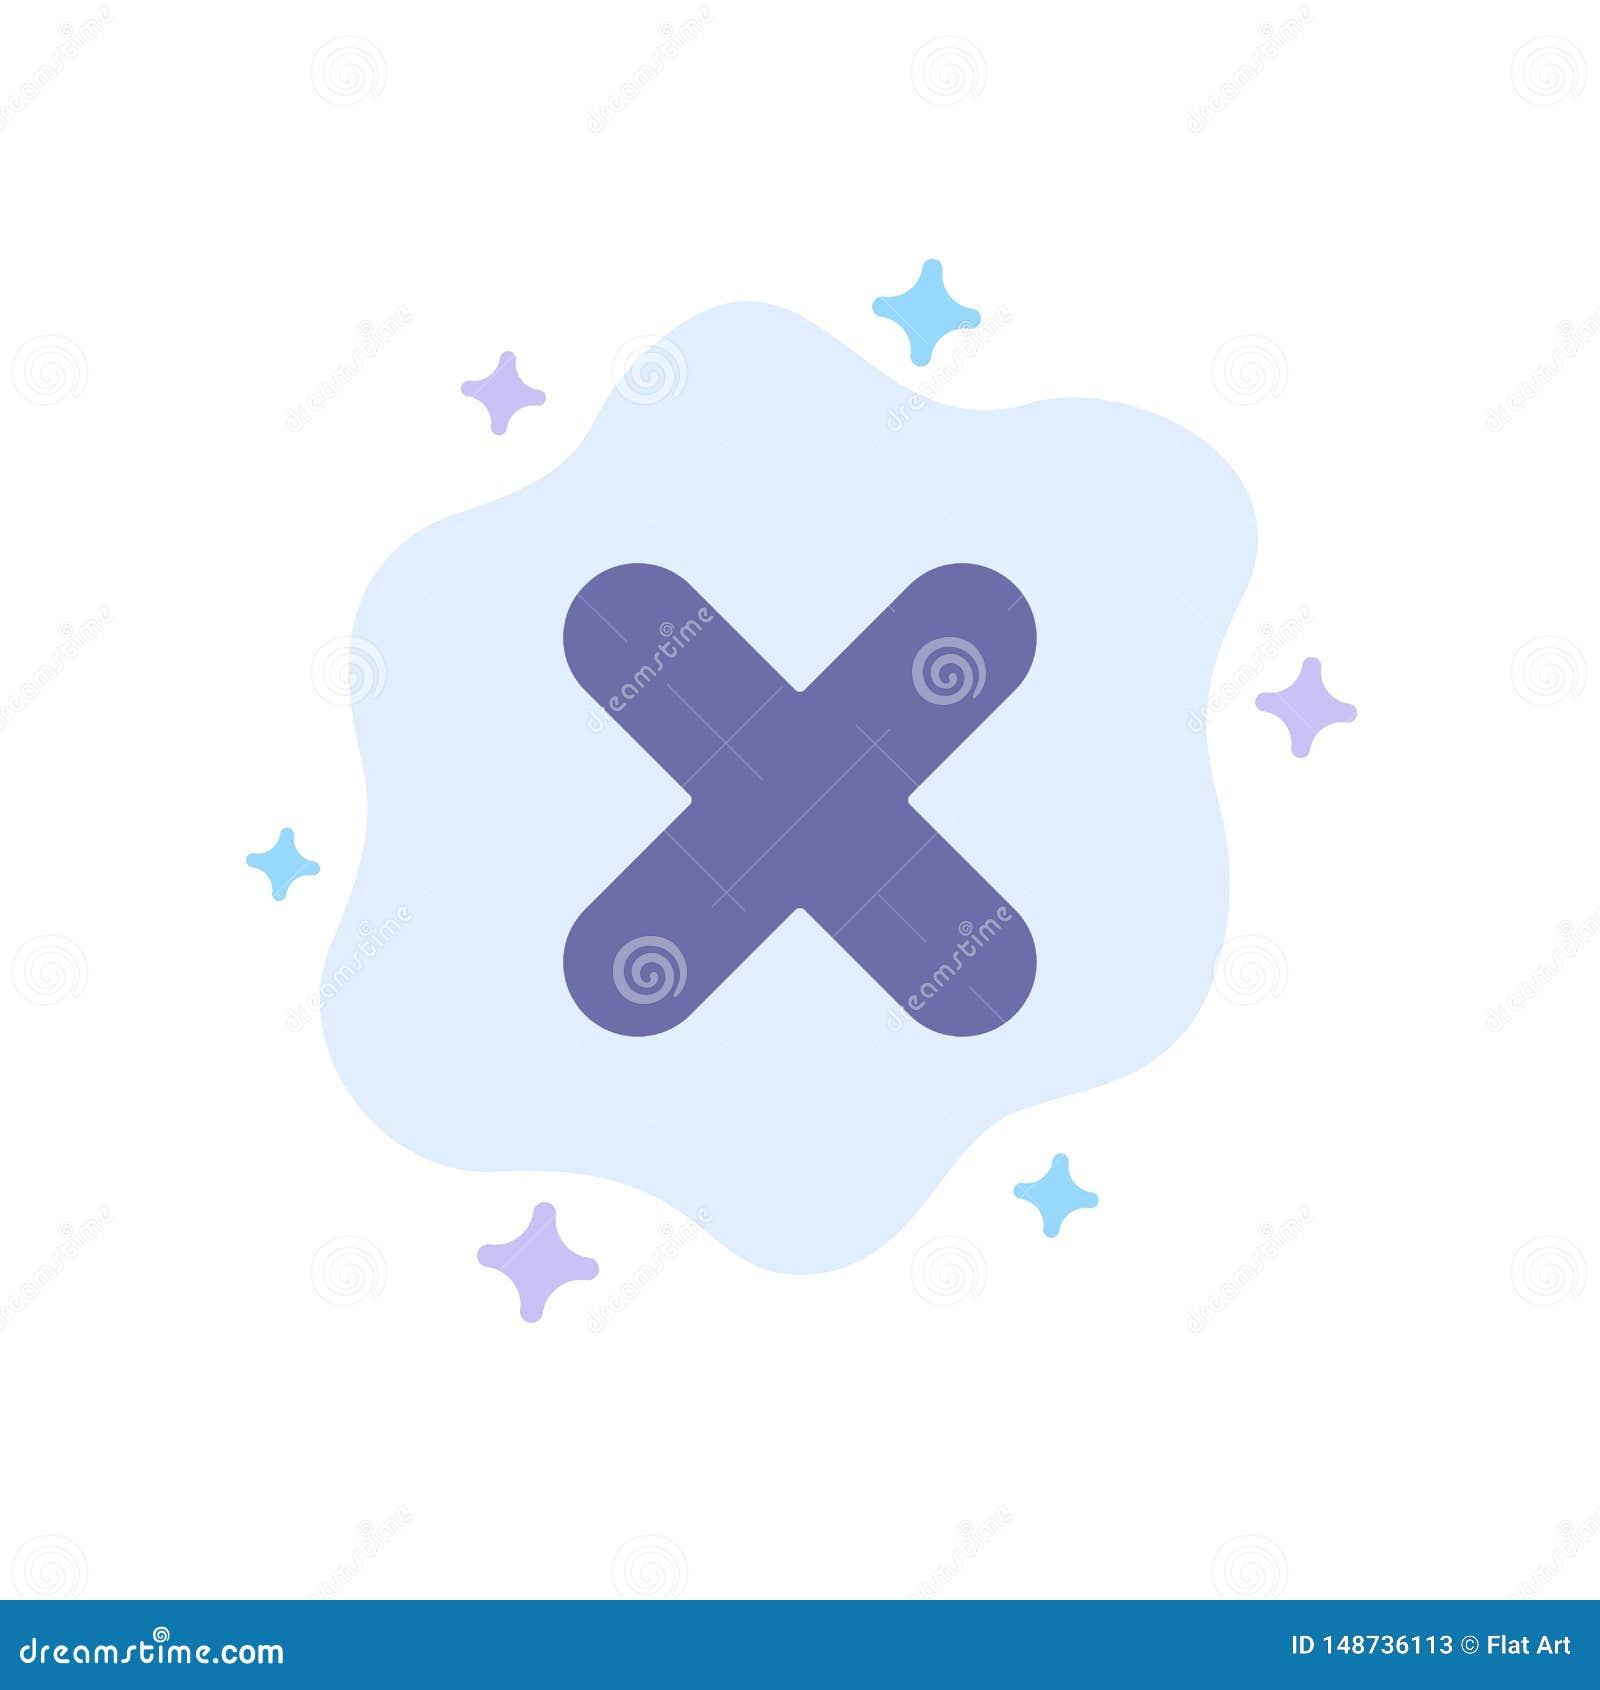 Borttagnings annullering, slut, arg blå symbol på abstrakt molnbakgrund